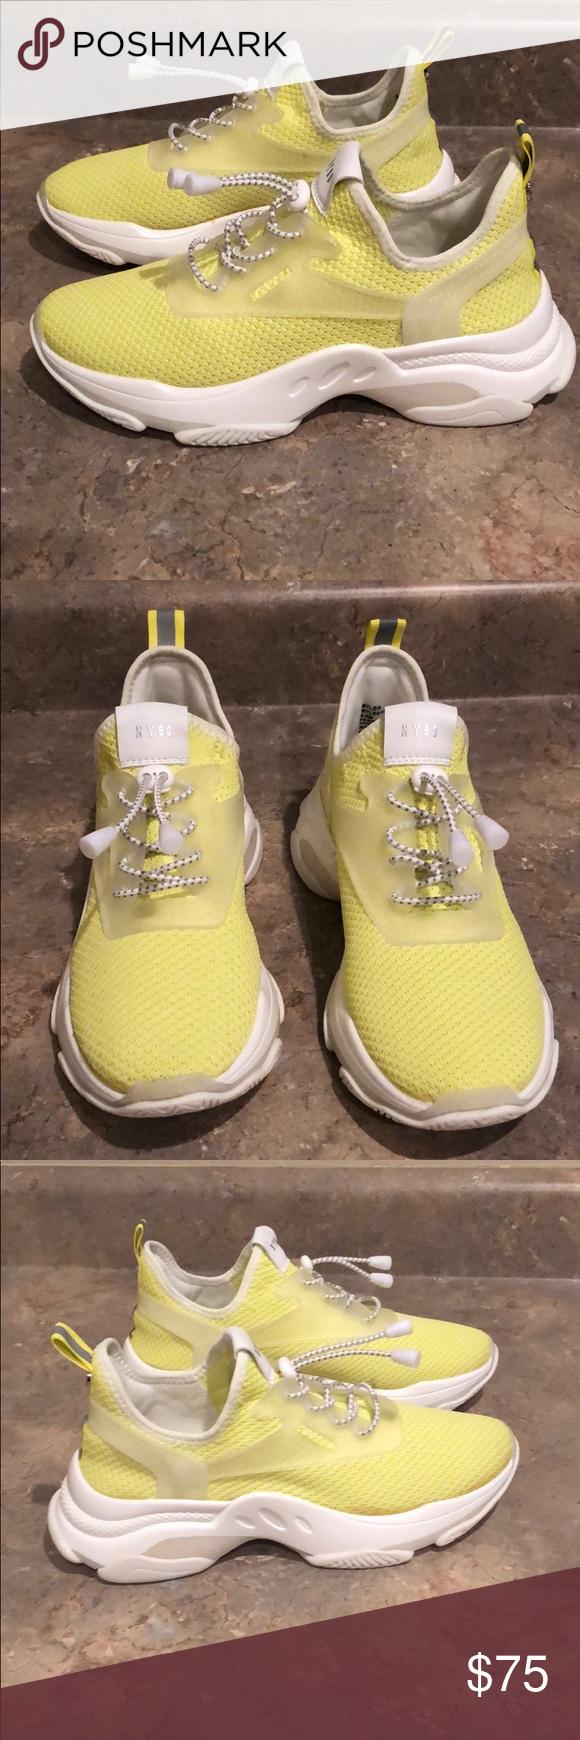 9ce8d45d5fe NEW) Steve Madden NY90 Sneakers Size: 9.5 (NEW) Steve Madden NY90 ...